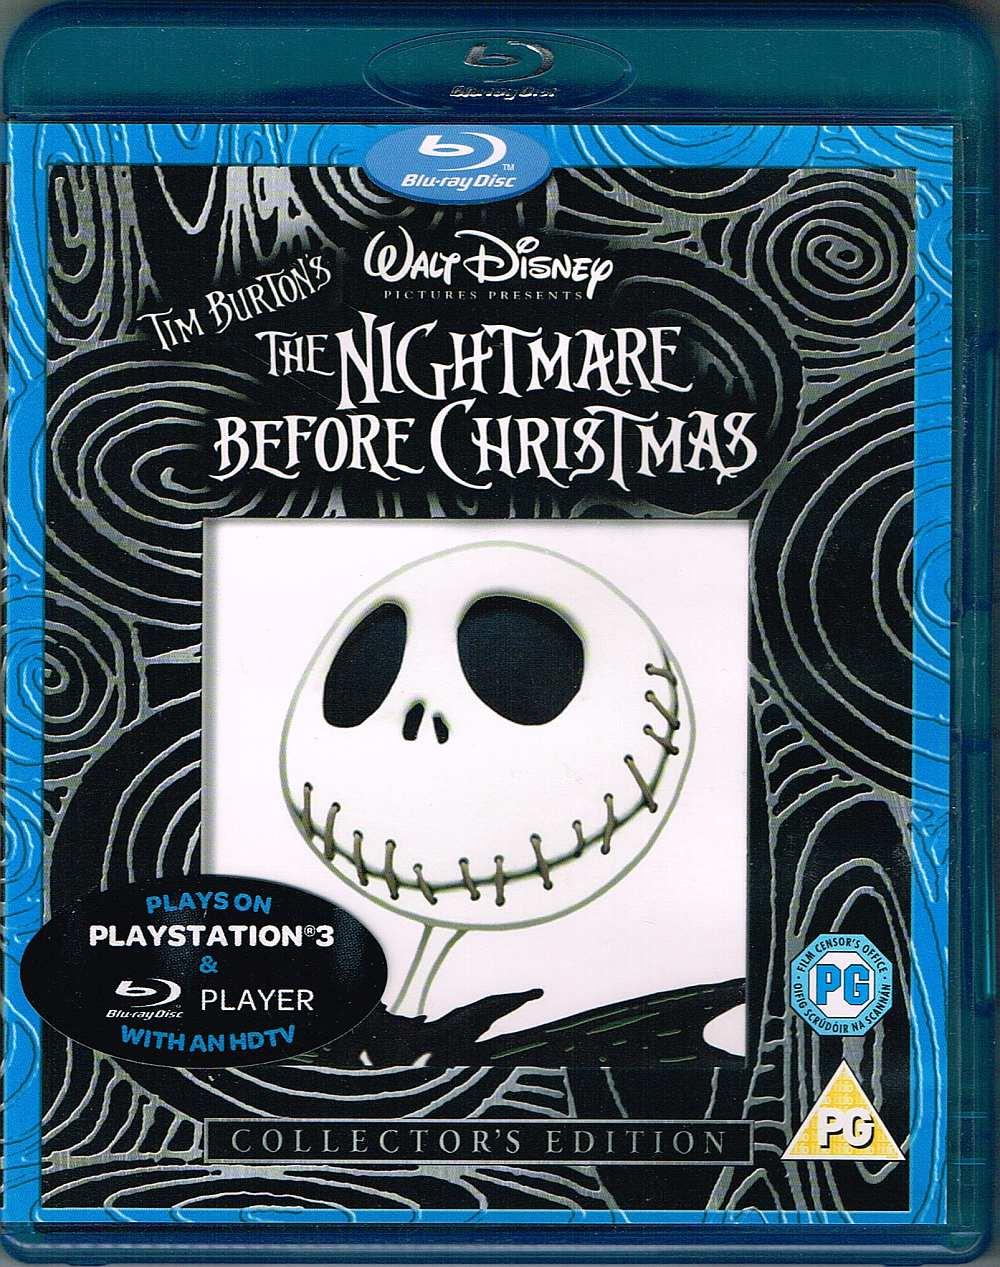 The Nightmare Before Christmas - 8717418177096 - Disney Blu-ray ...